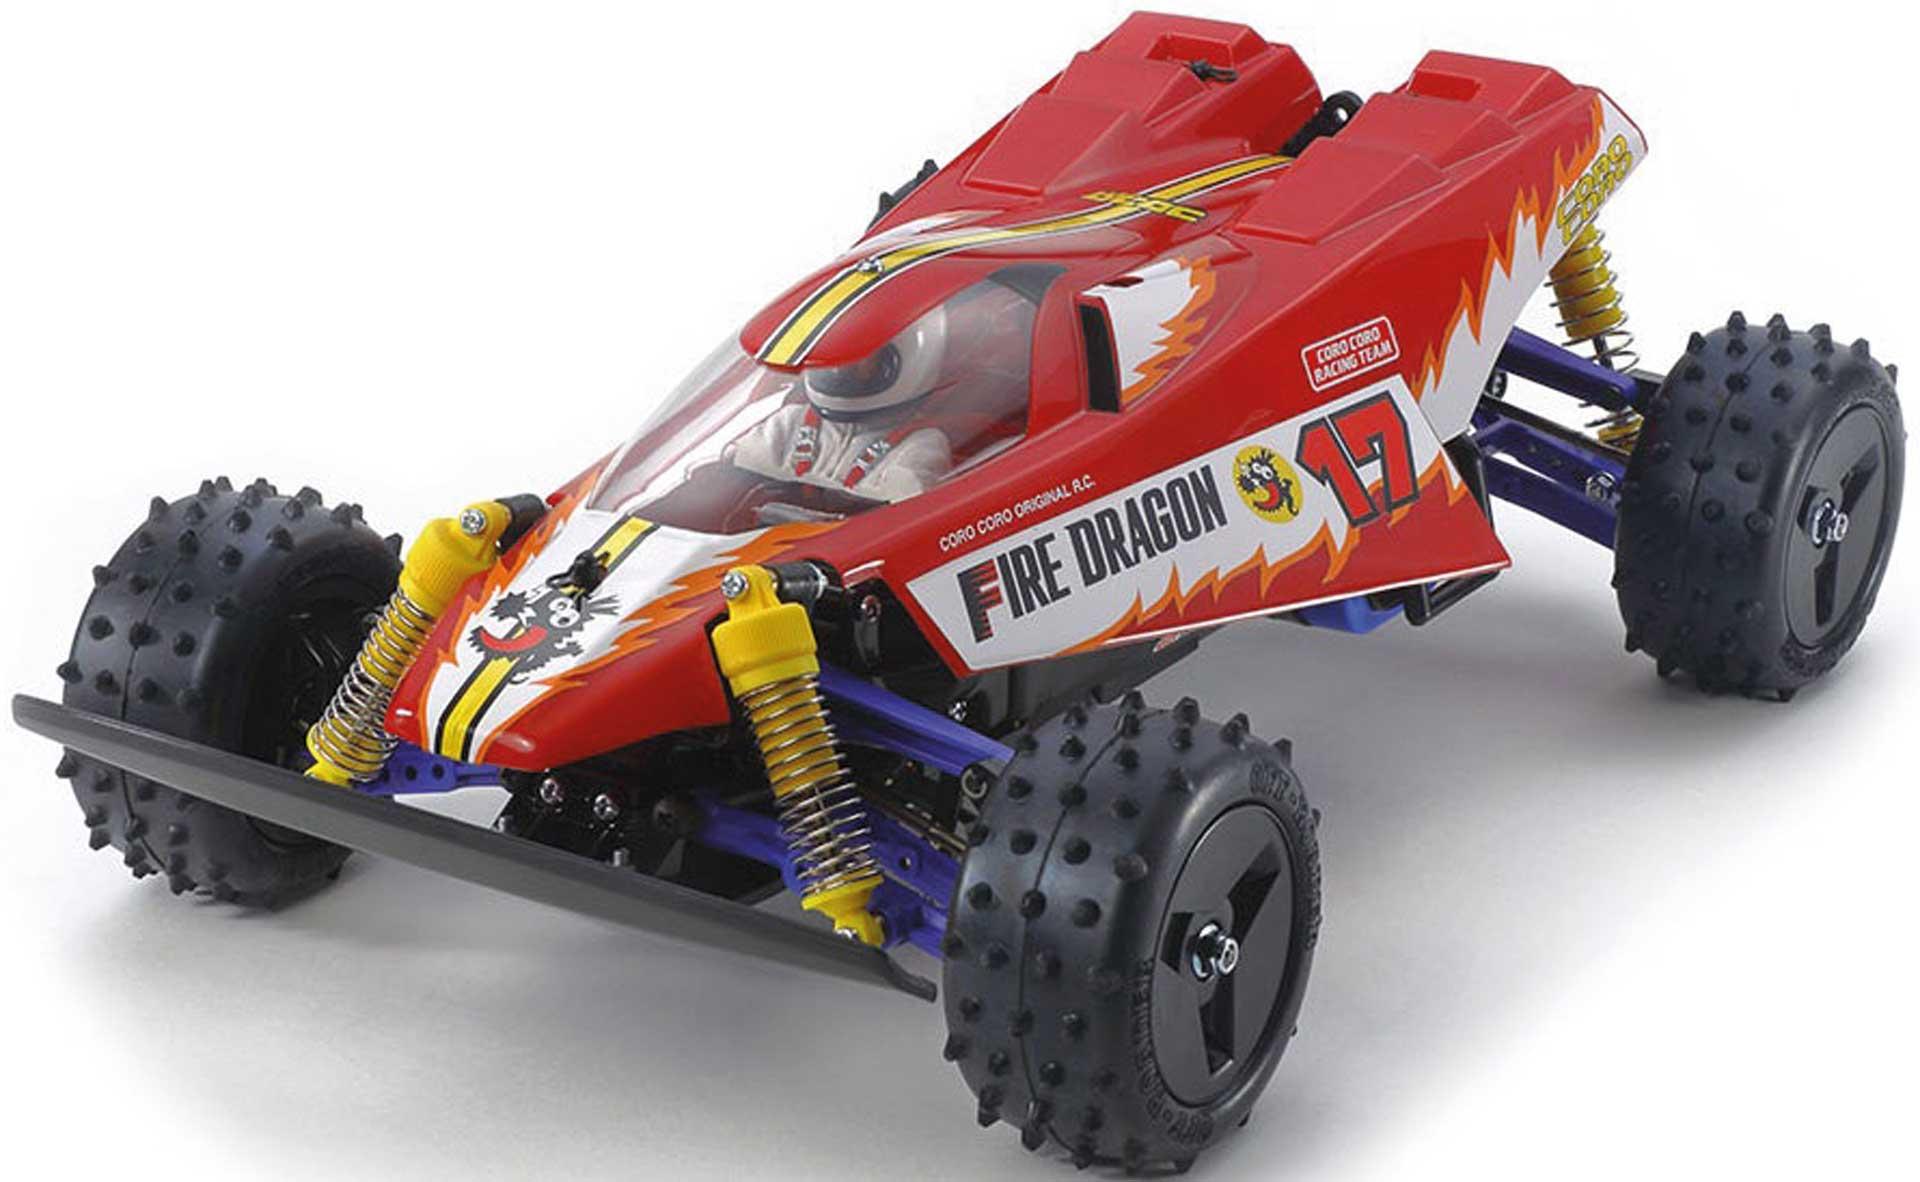 TAMIYA Fire Dragon 2020 1/10 4WD Buggy Kit